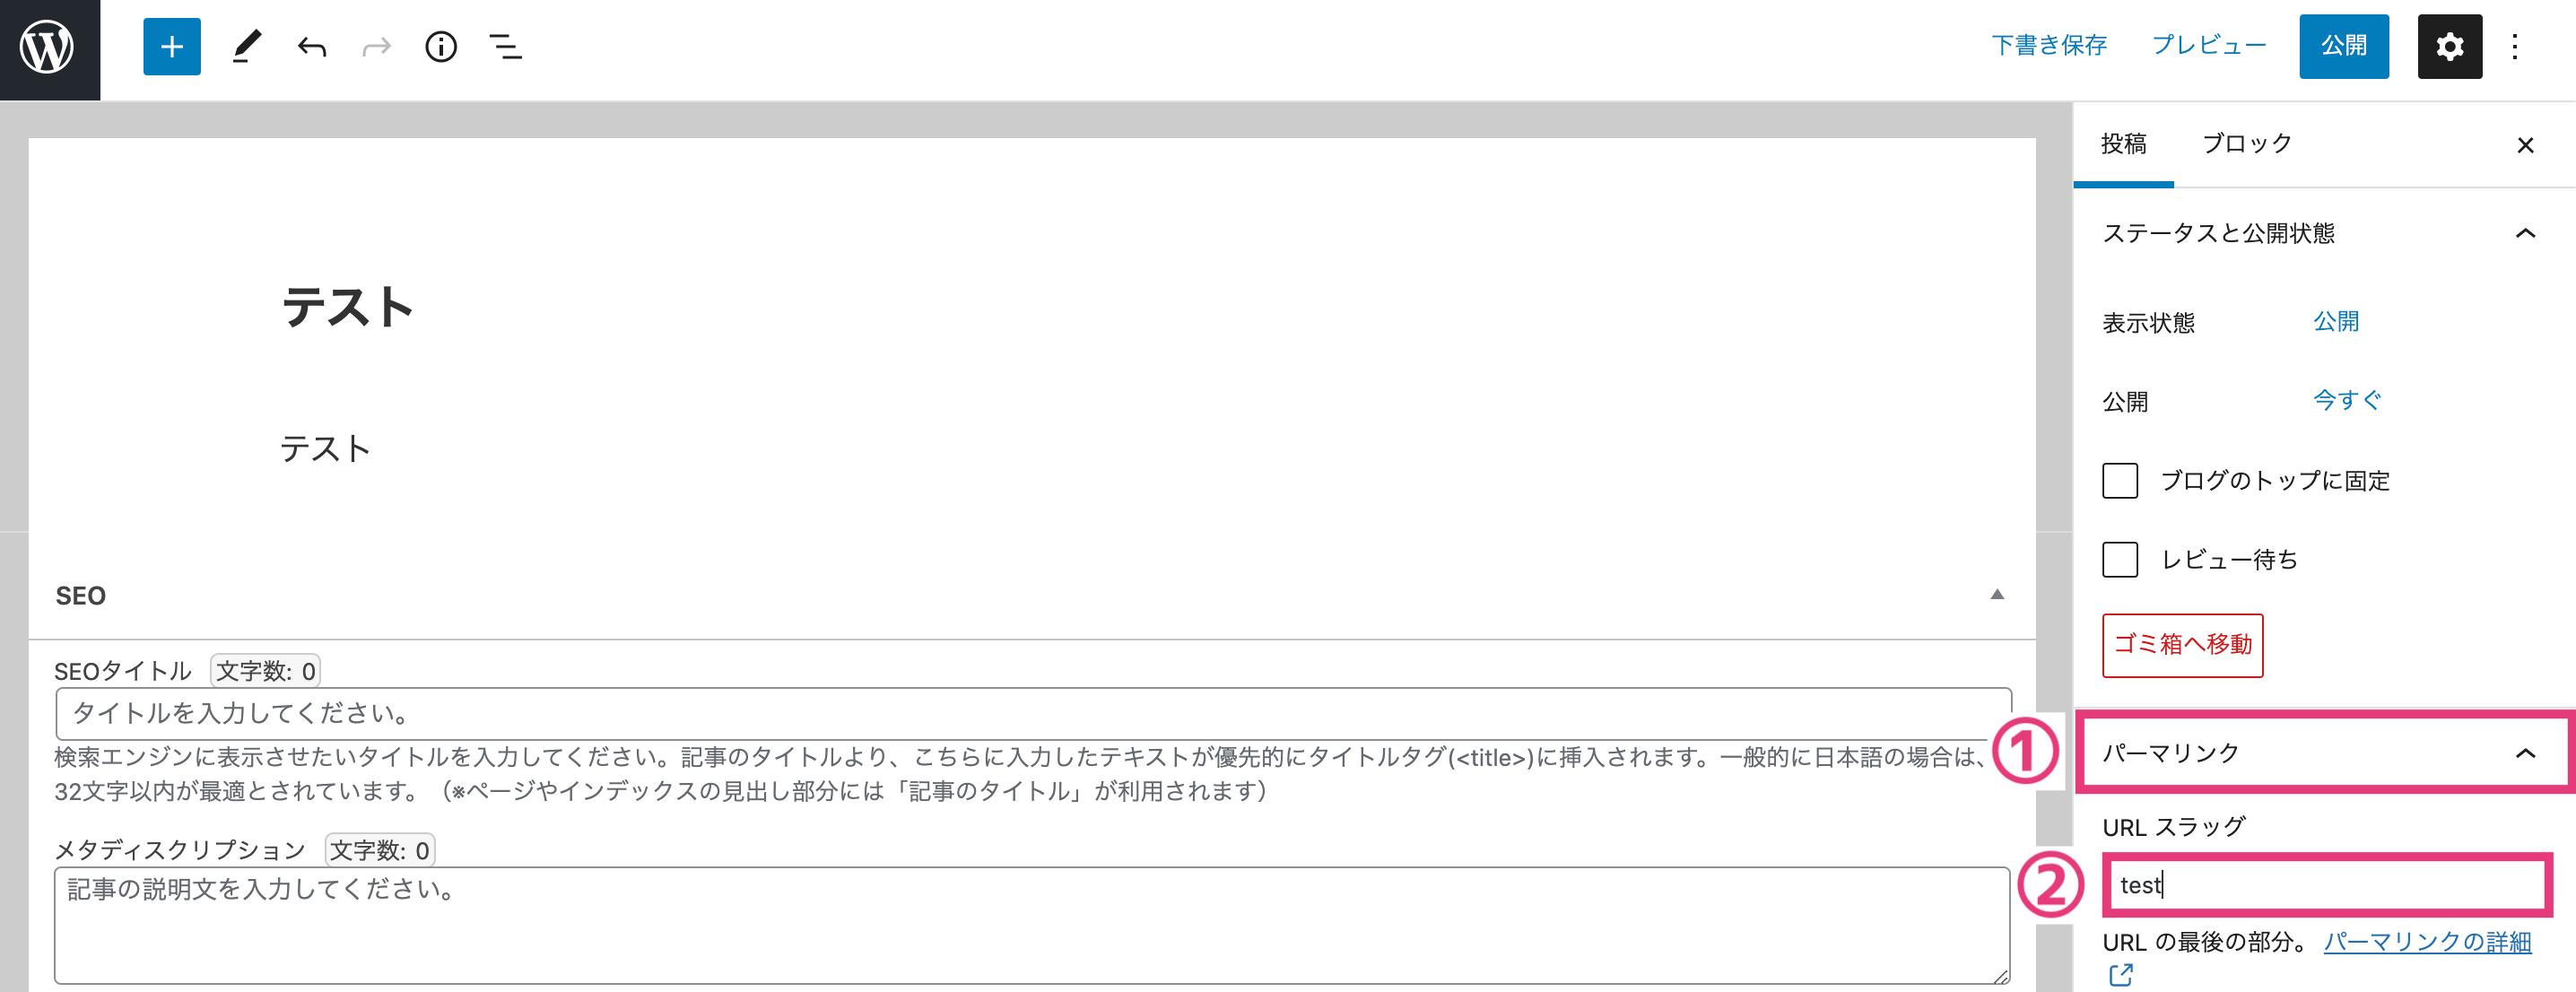 「URLスラッグ」を変更